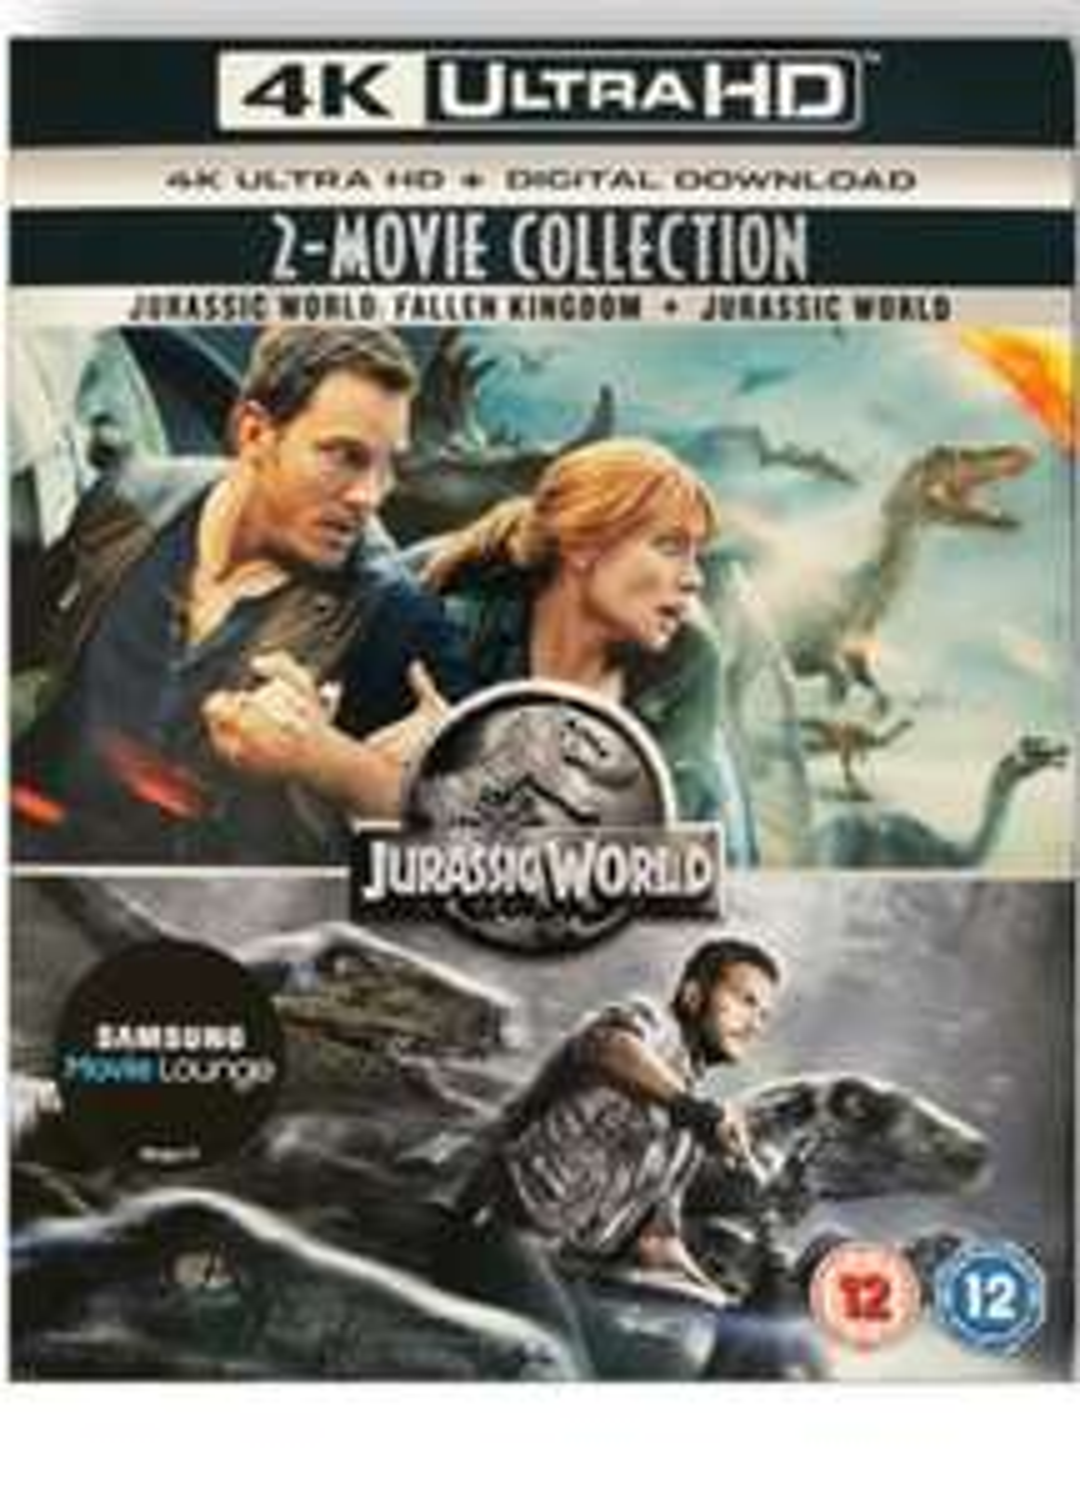 Jurassic World/Jurassic World Fallen Kingdom Collection 4k UHD £8.95 delivered @ PRC Direct